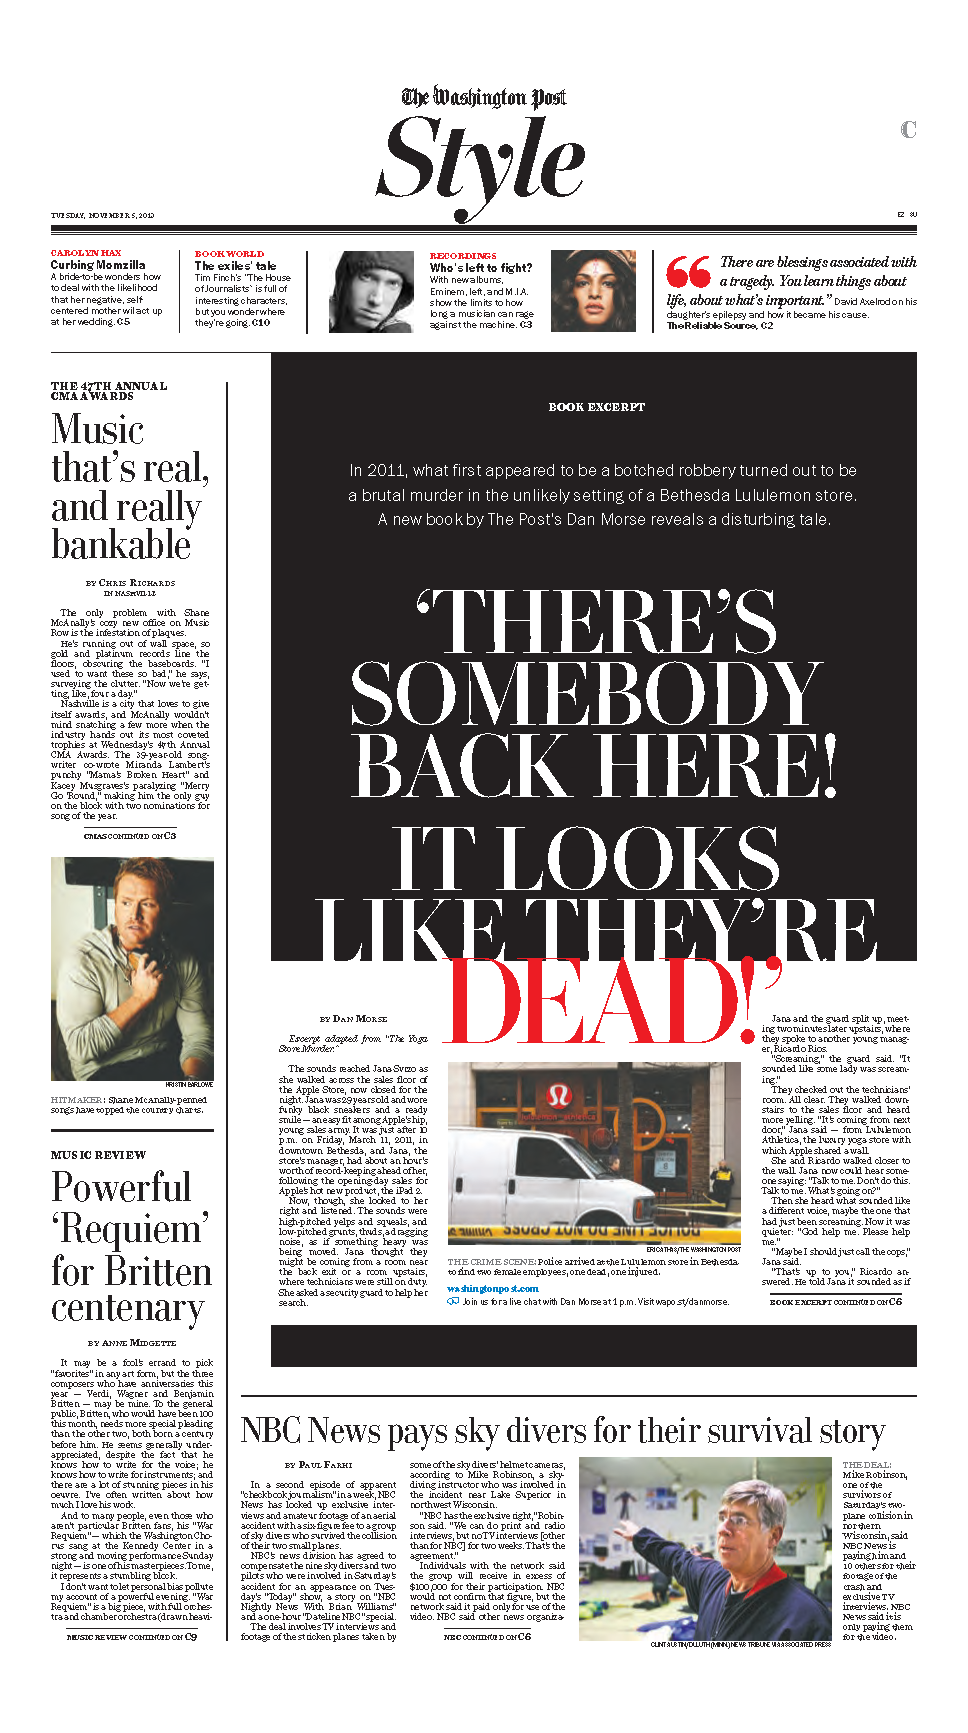 Washington Post Design Post Design Newspaper Design Newspaper Layout